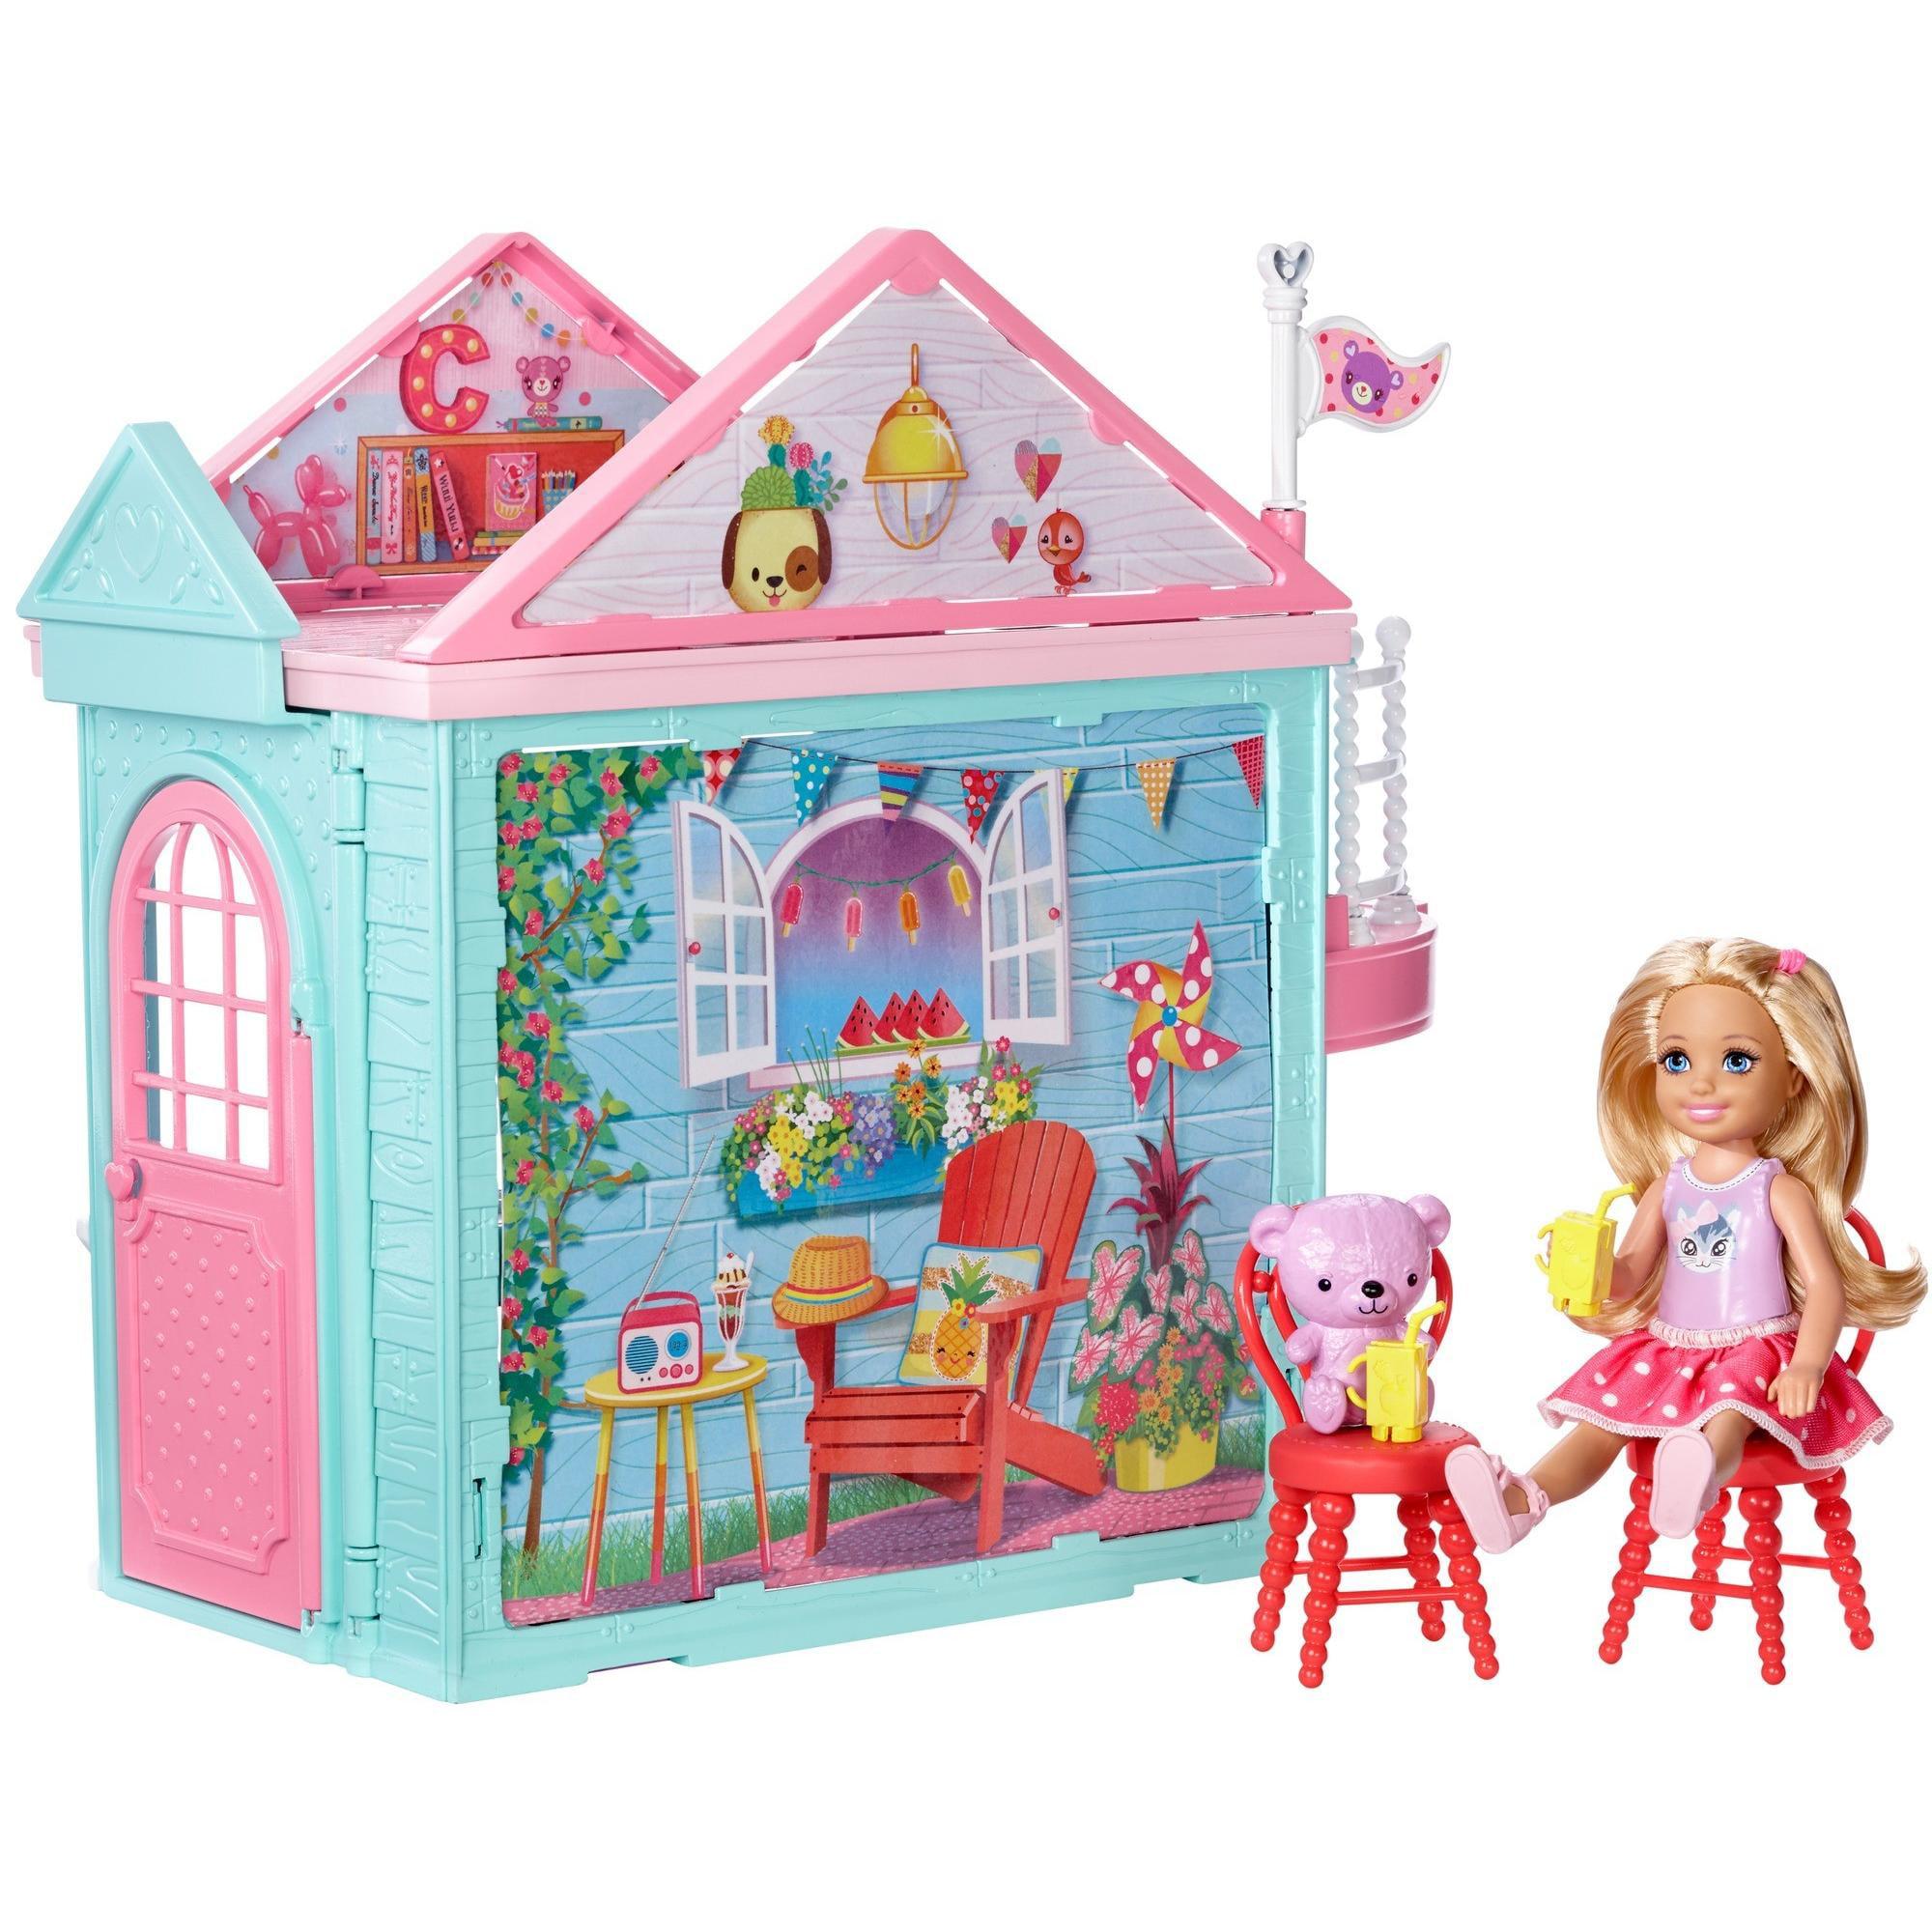 Barbie Club Chelsea Playhouse - Walmart.com